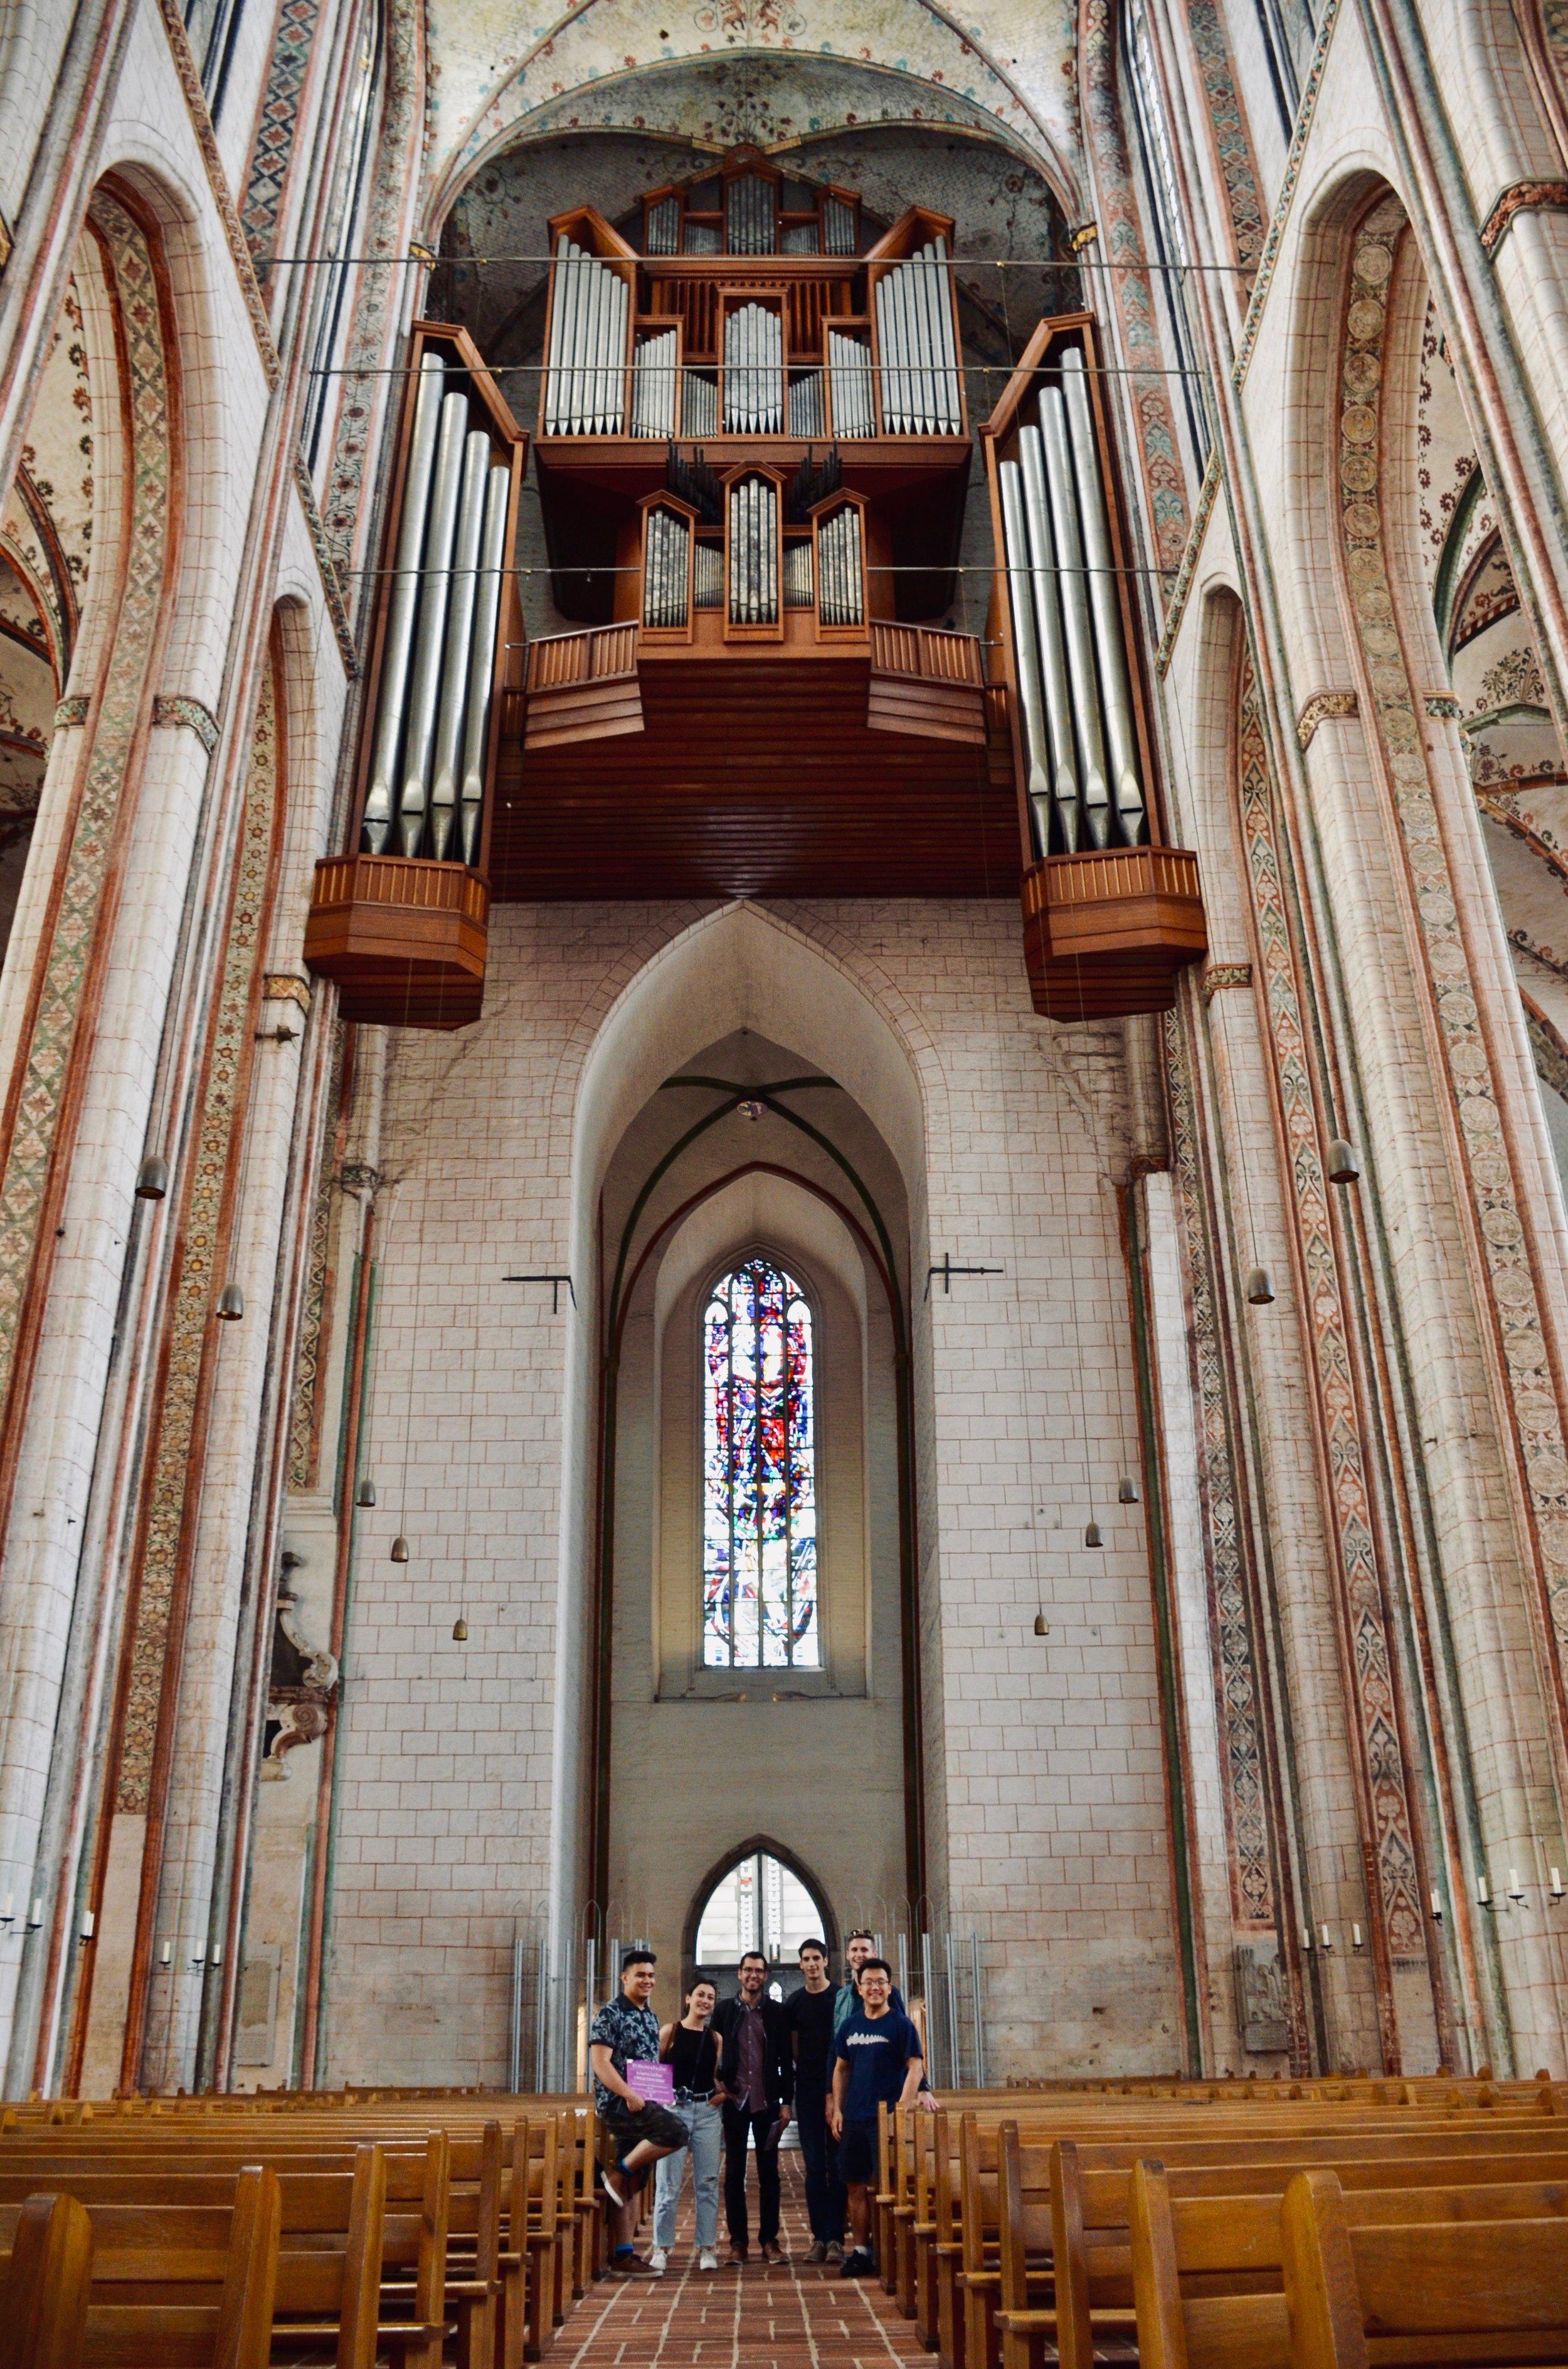 Members of Boston Organ Studio in Marienkirche, Lübeck, home church of Dietrich Buxtehude.